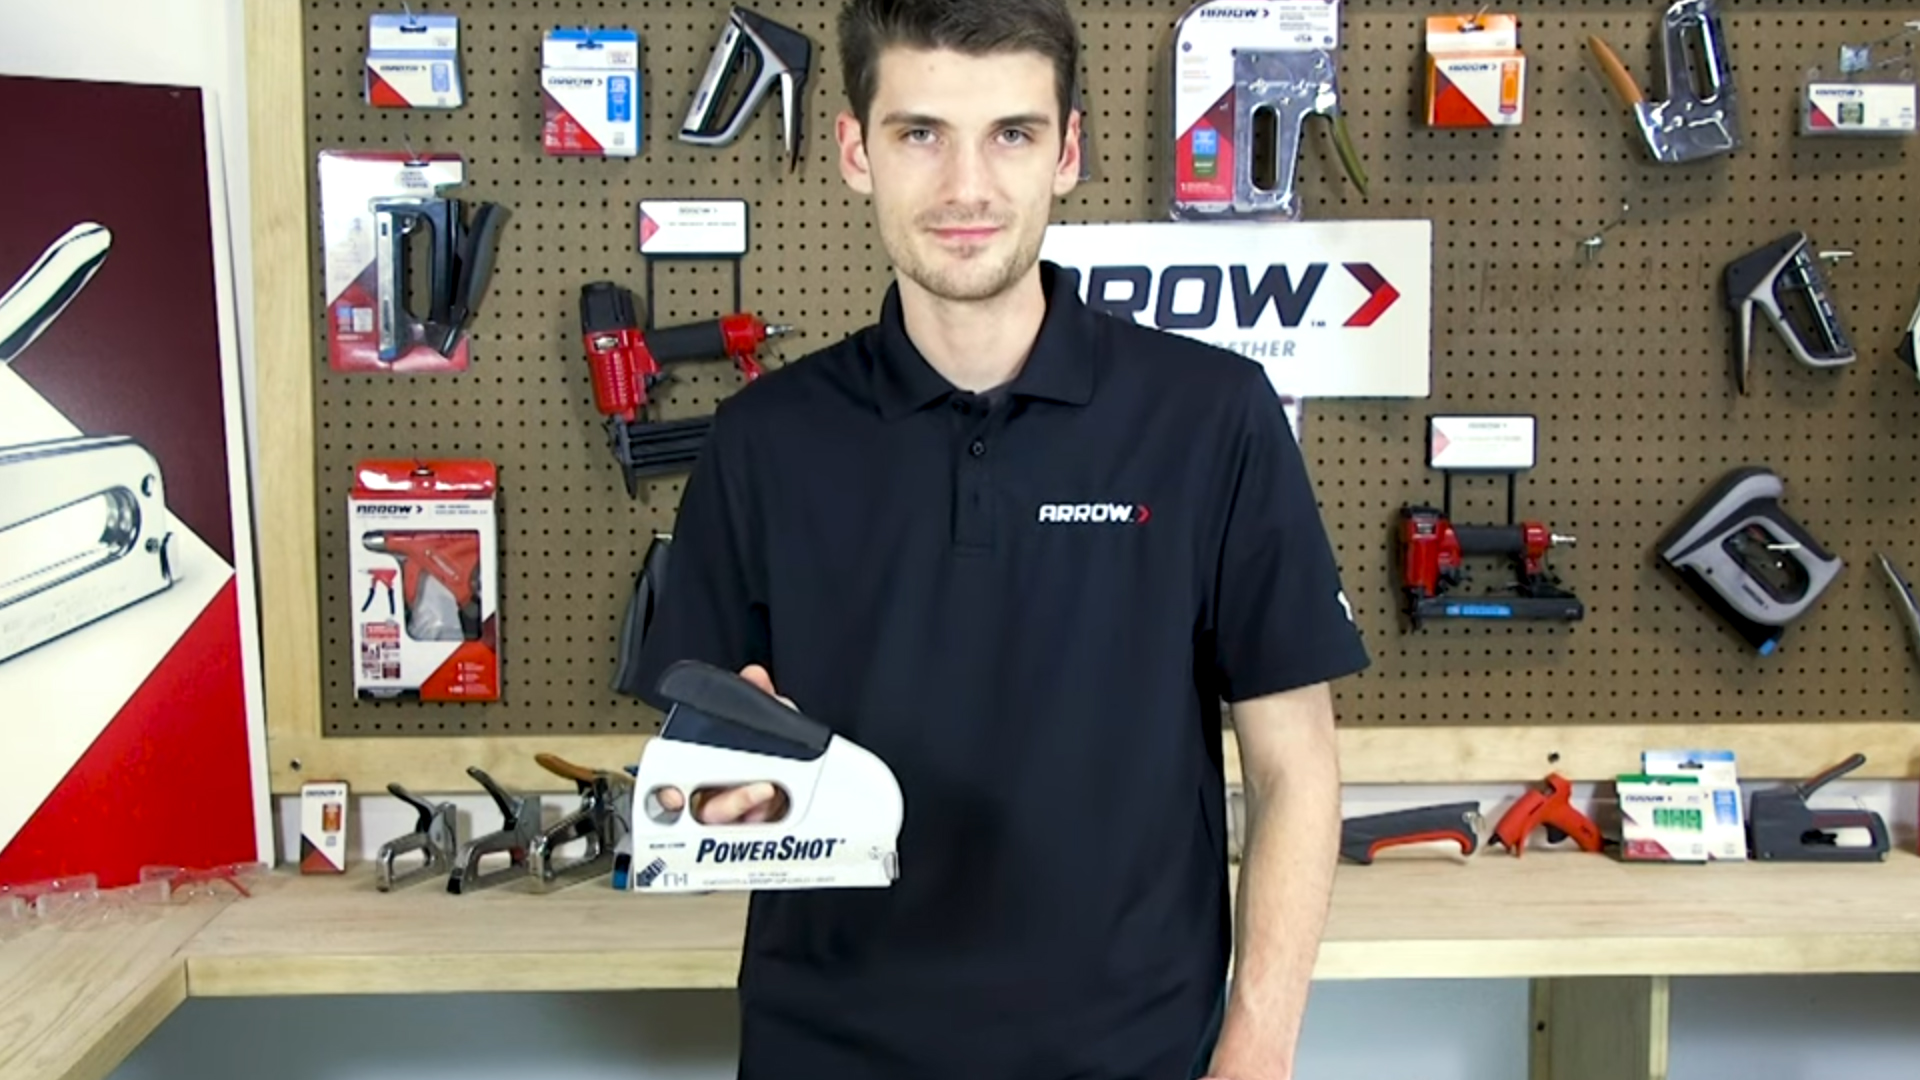 PowerShot 5700 Forward Action Staple Gun and Nailer